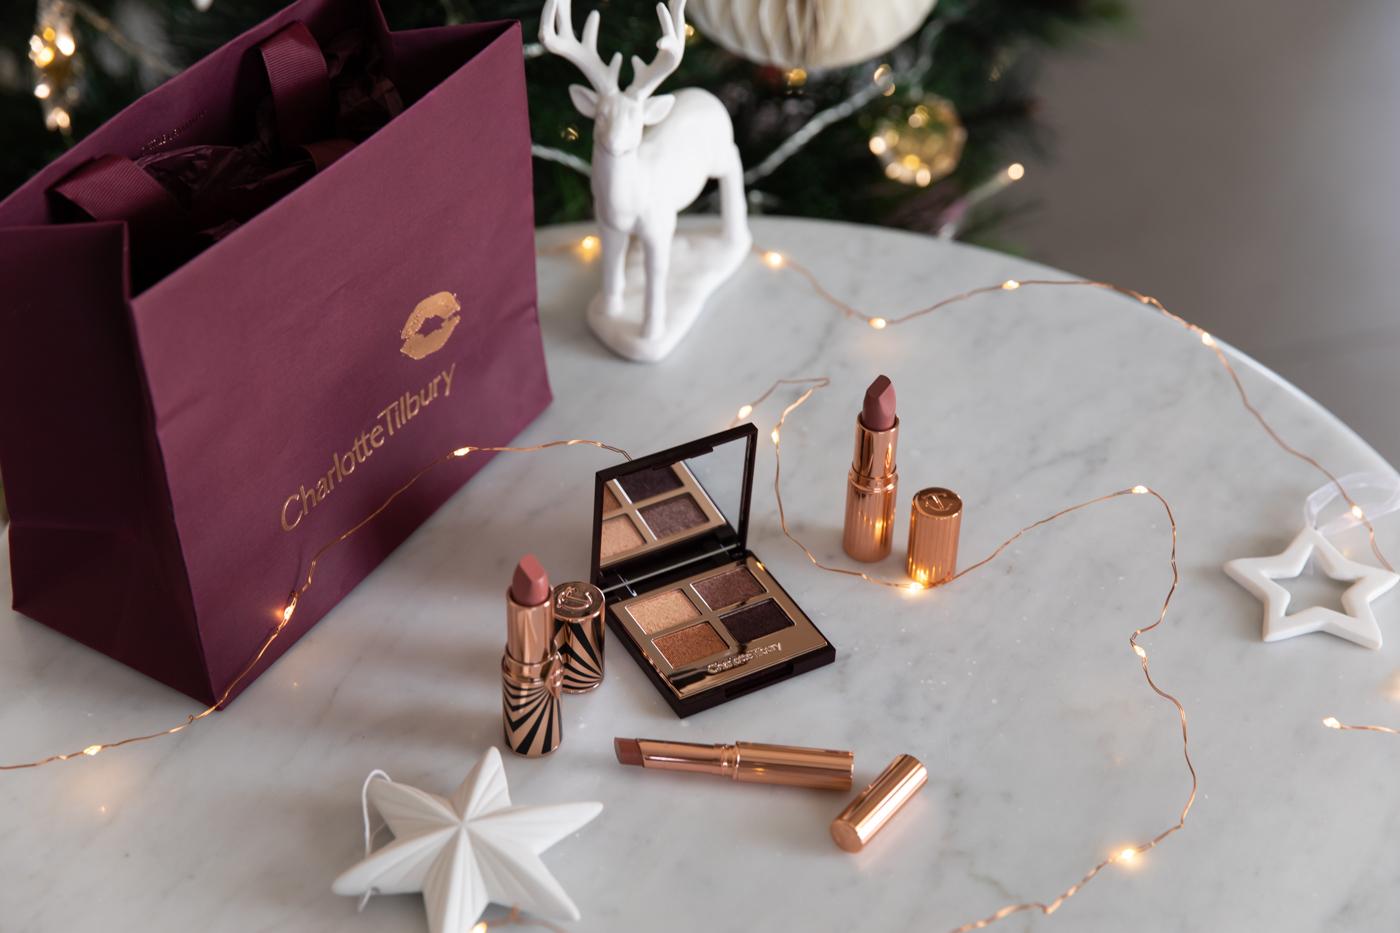 Charlotte Tilbury Christmas gift ideas 2019